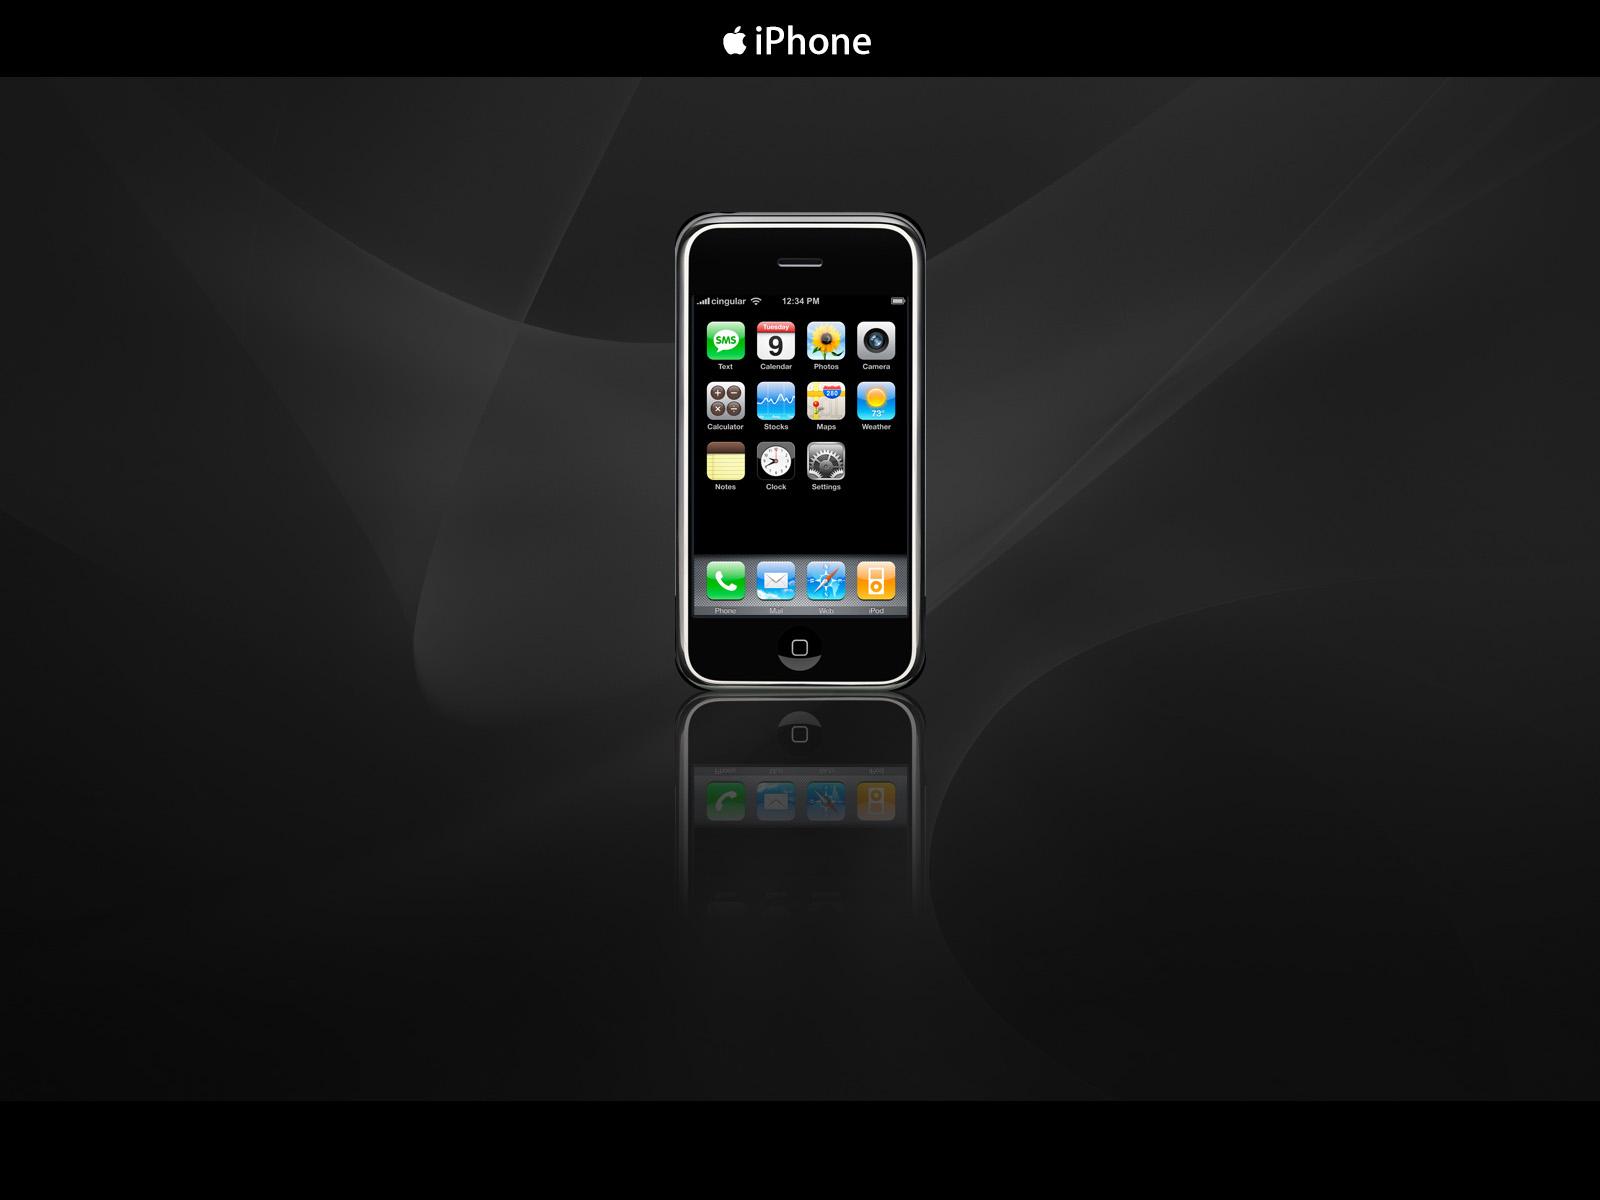 Iphone Hd Wallpaper: Apple IPhone Wallpapers HD